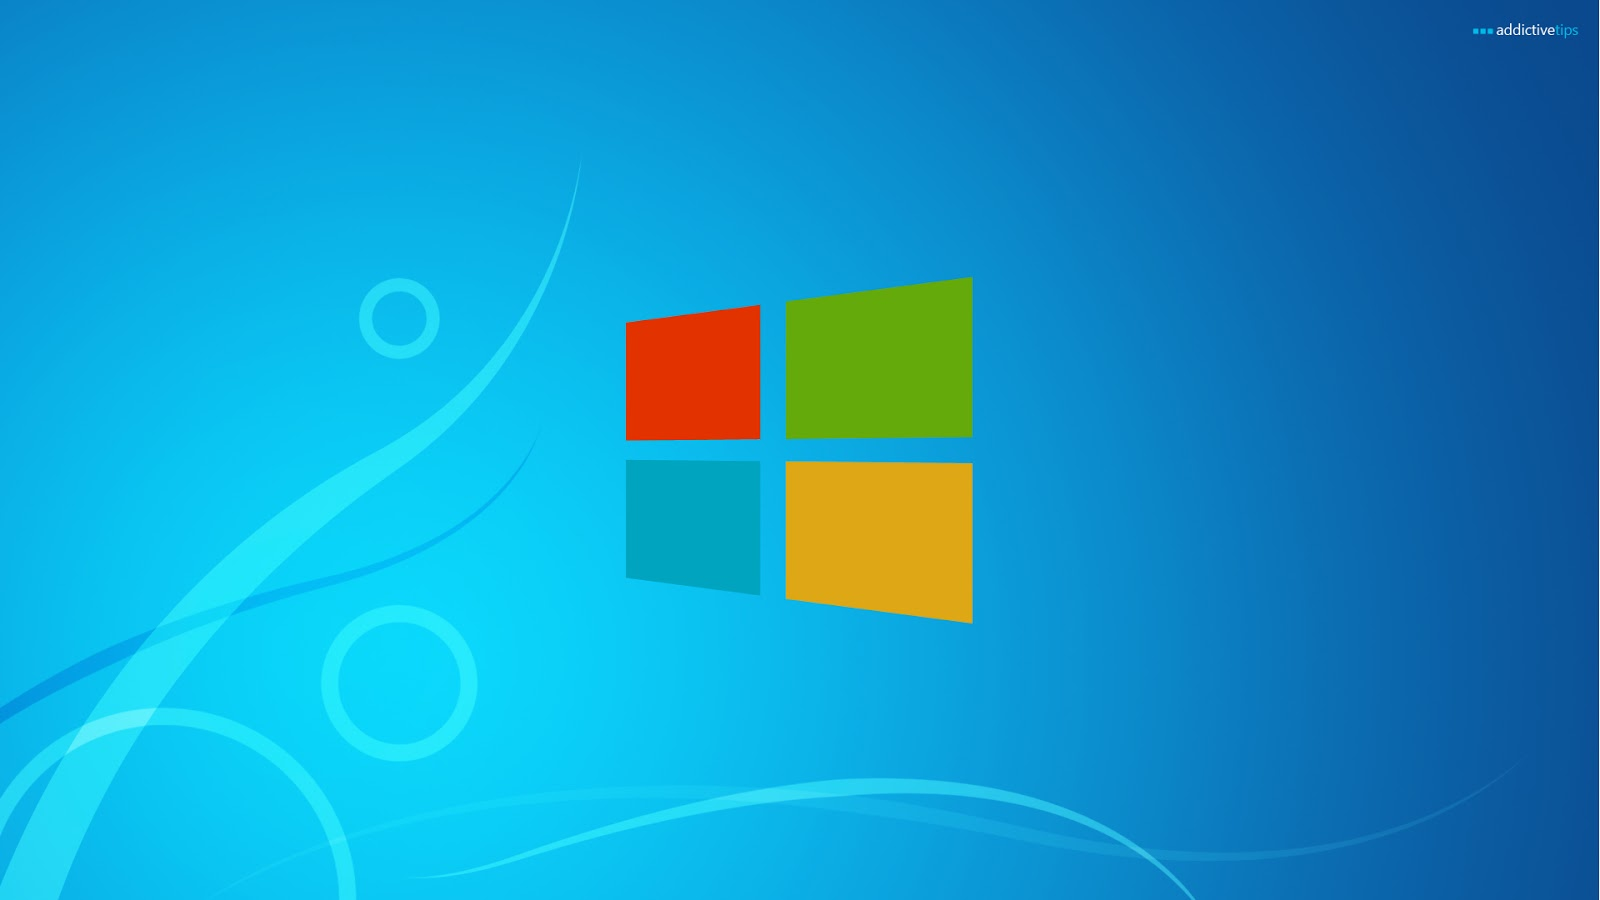 windows 8 wallpaper hd hd desktop 10 hd wallpapers hdwalli brands 1600x900